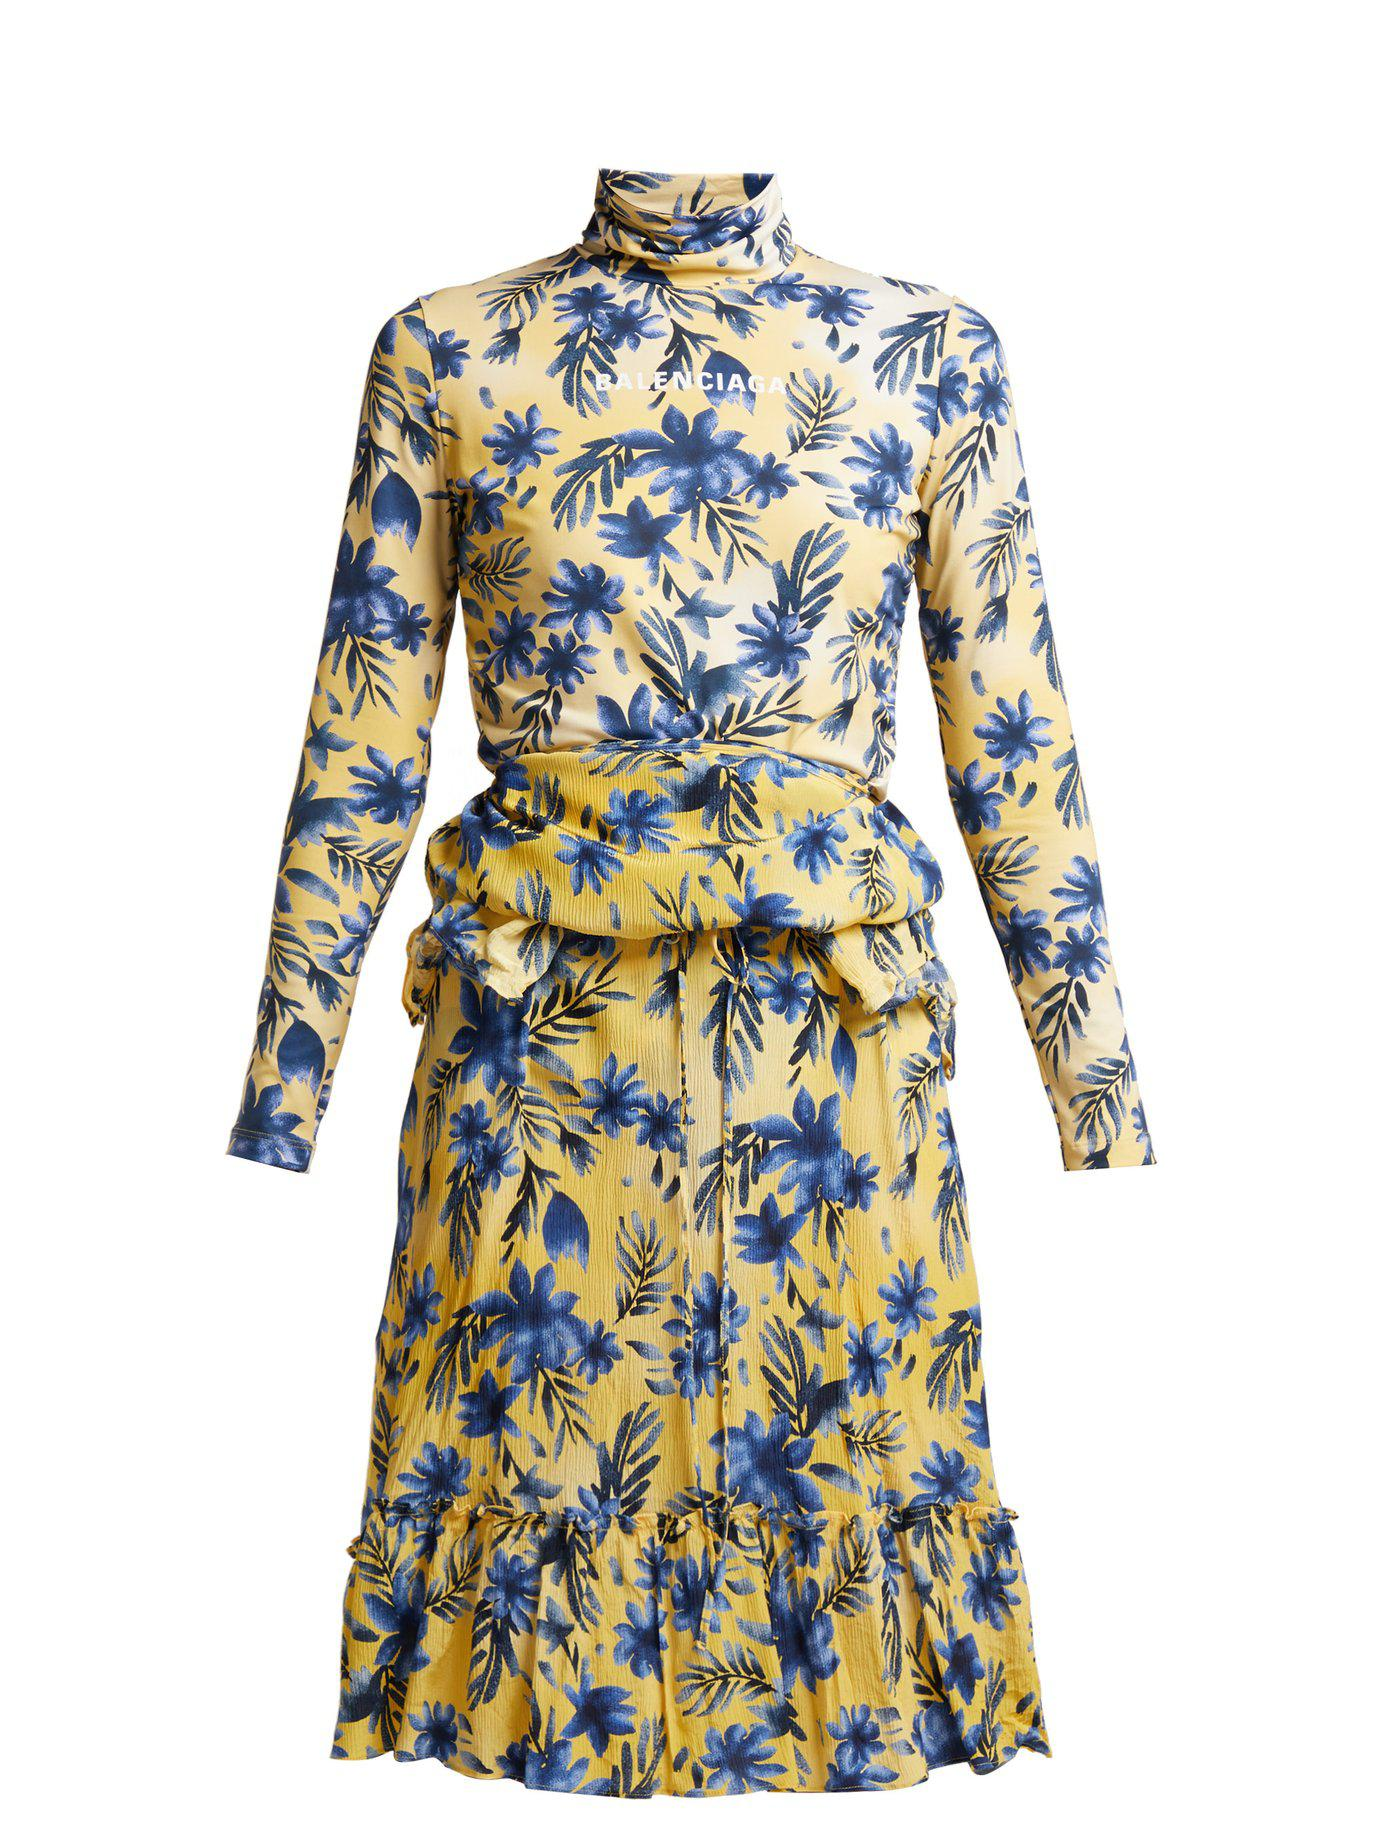 e9b48ed0c911 Lyst - Balenciaga Floral Print Stretch Jersey And Silk Crepe Dress ...